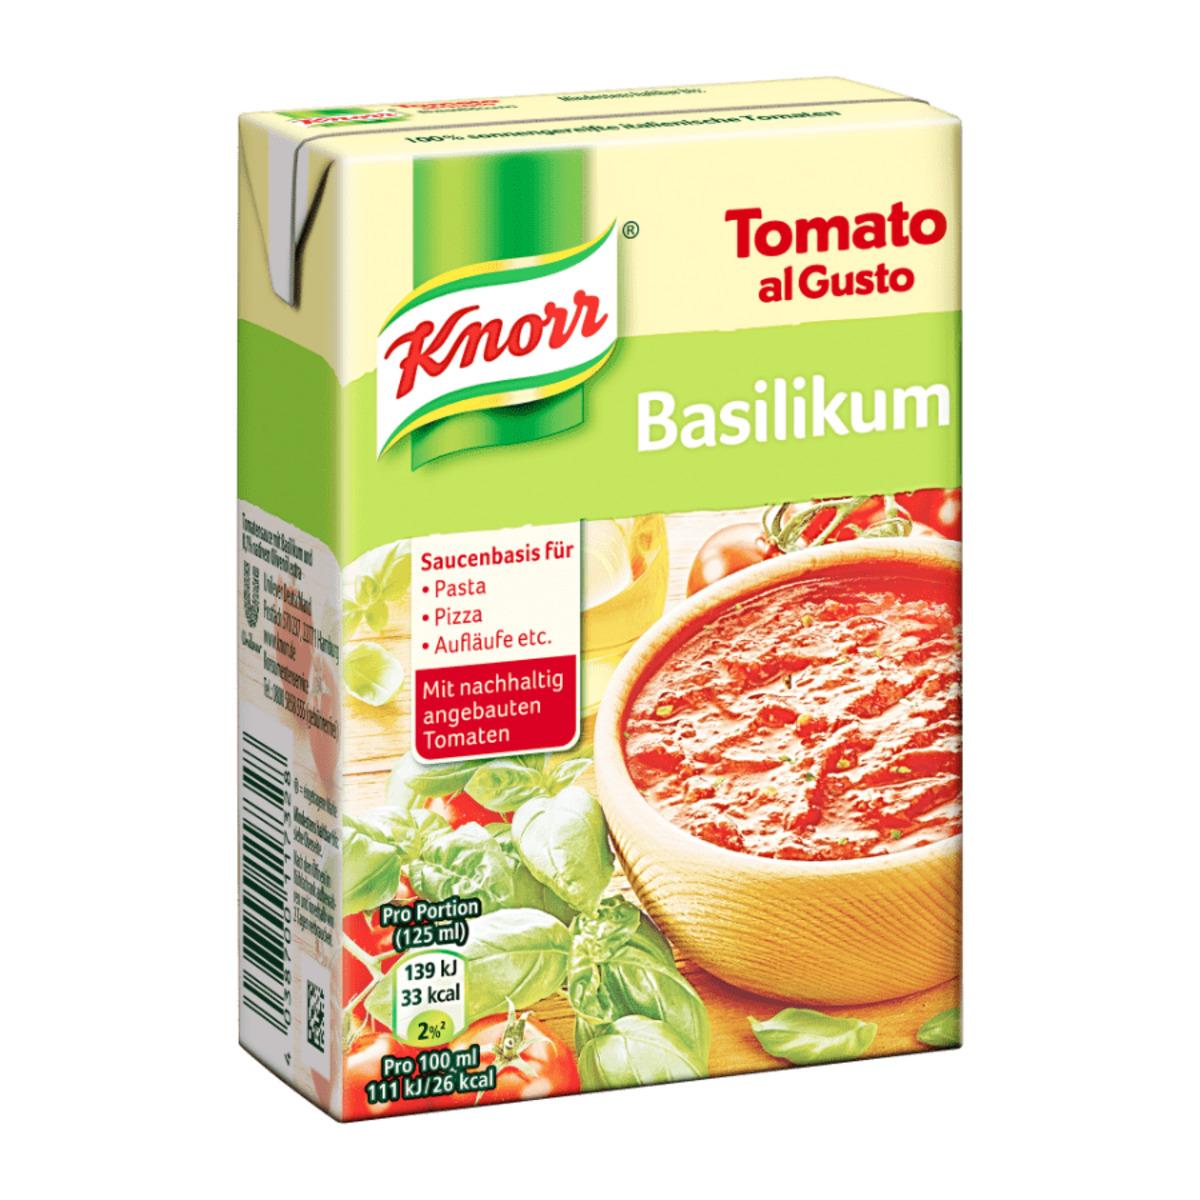 Bild 4 von Knorr Tomato al Gusto